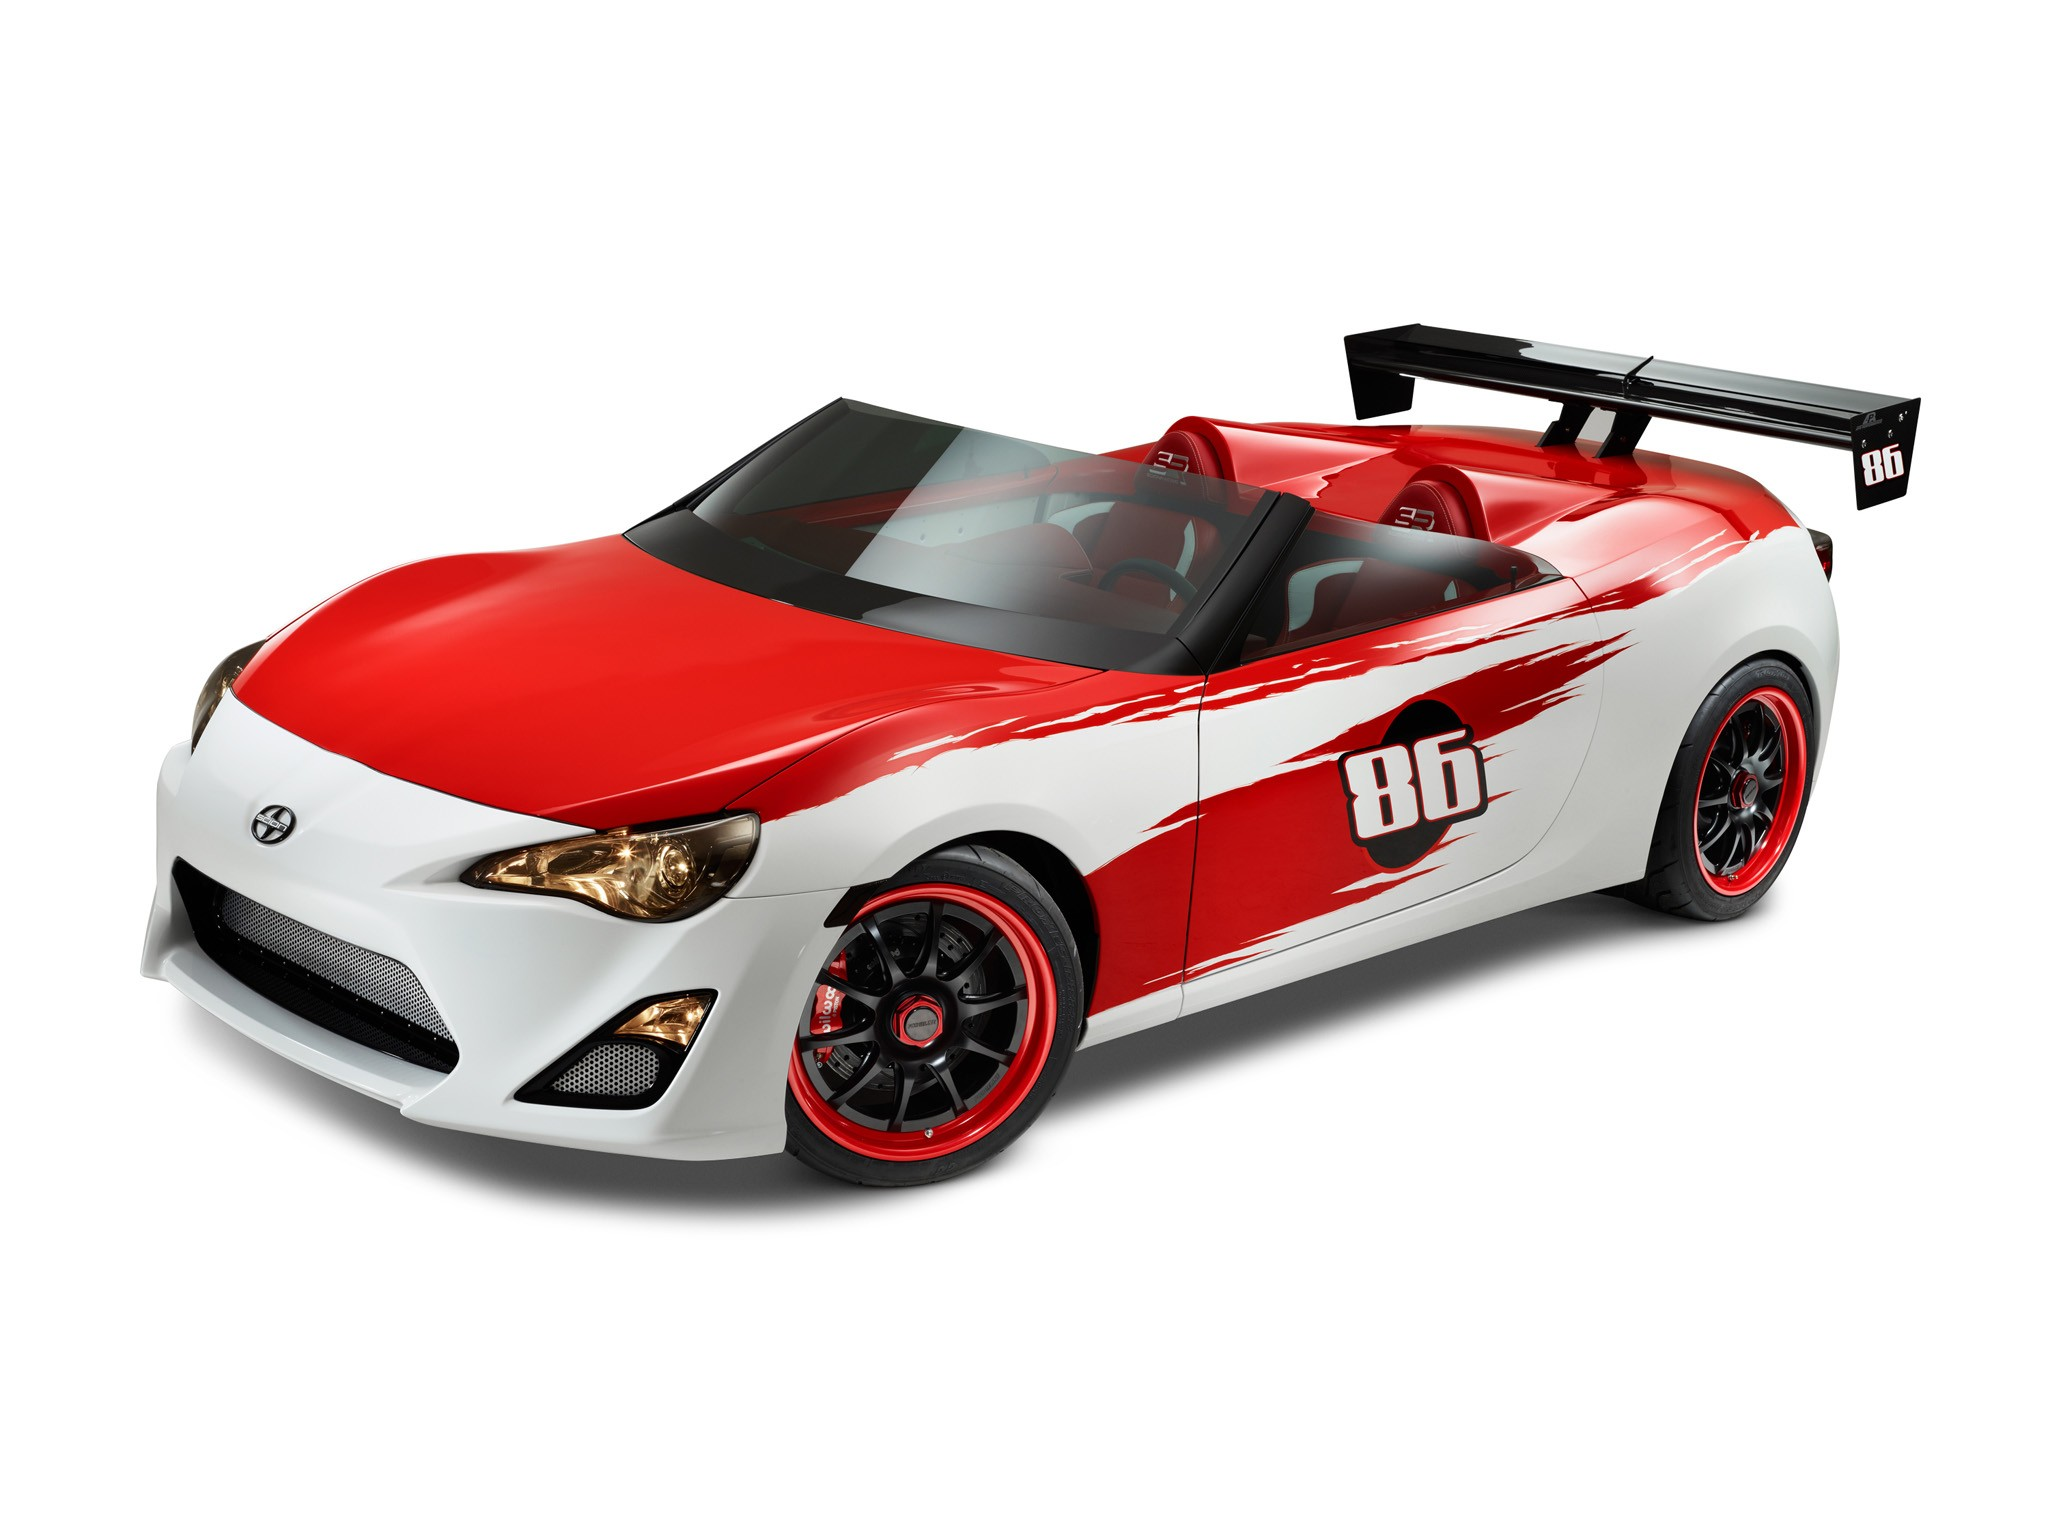 2012 Scion FR-S Speedster Concept by Cartel Customs